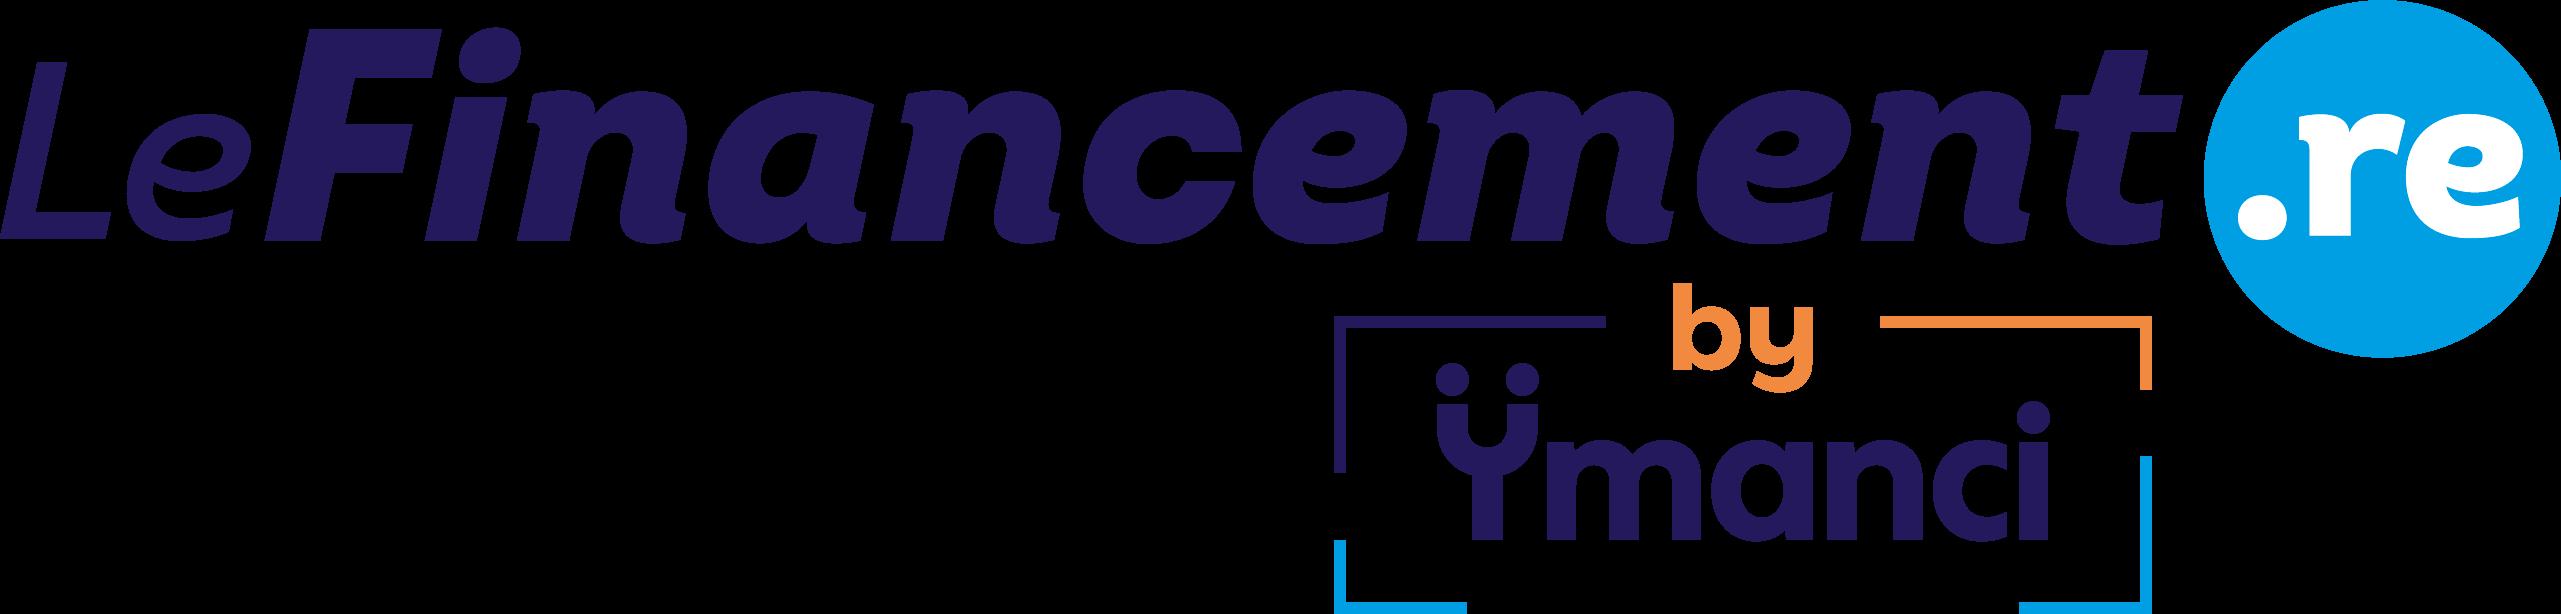 LeFinancement.re by Ÿmanci